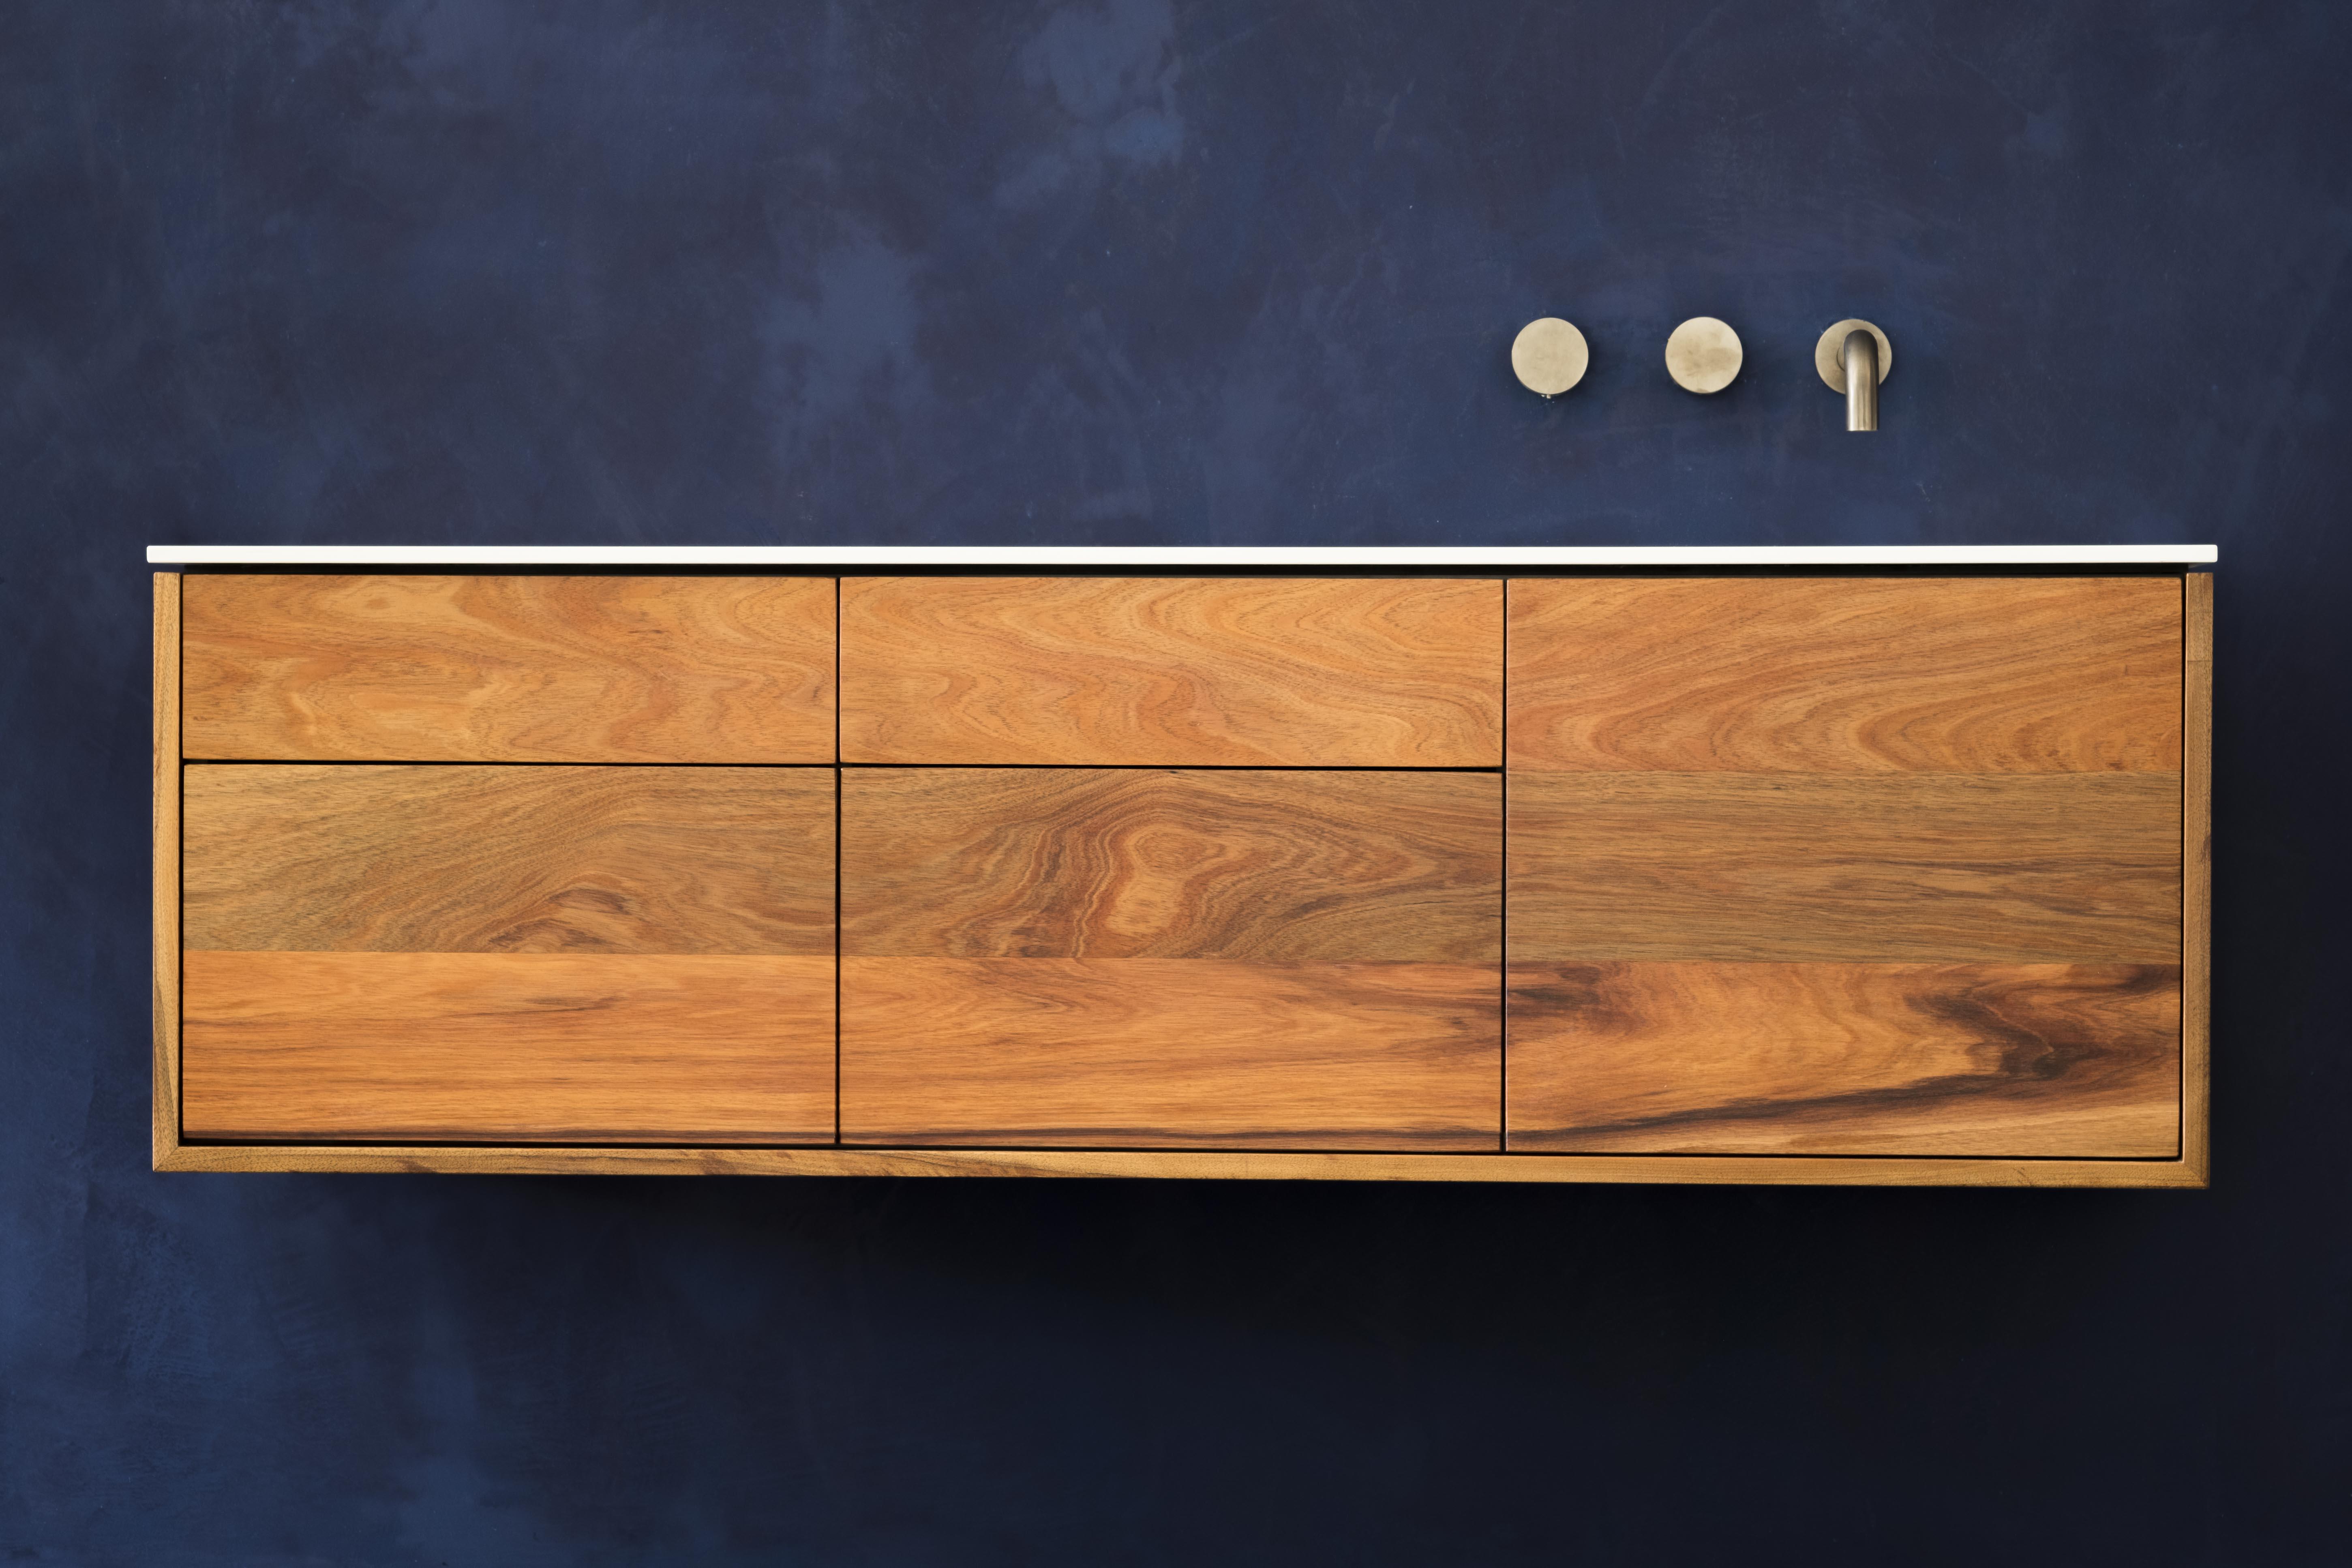 Stone and Wood Bathroom Vanity - Blackwood